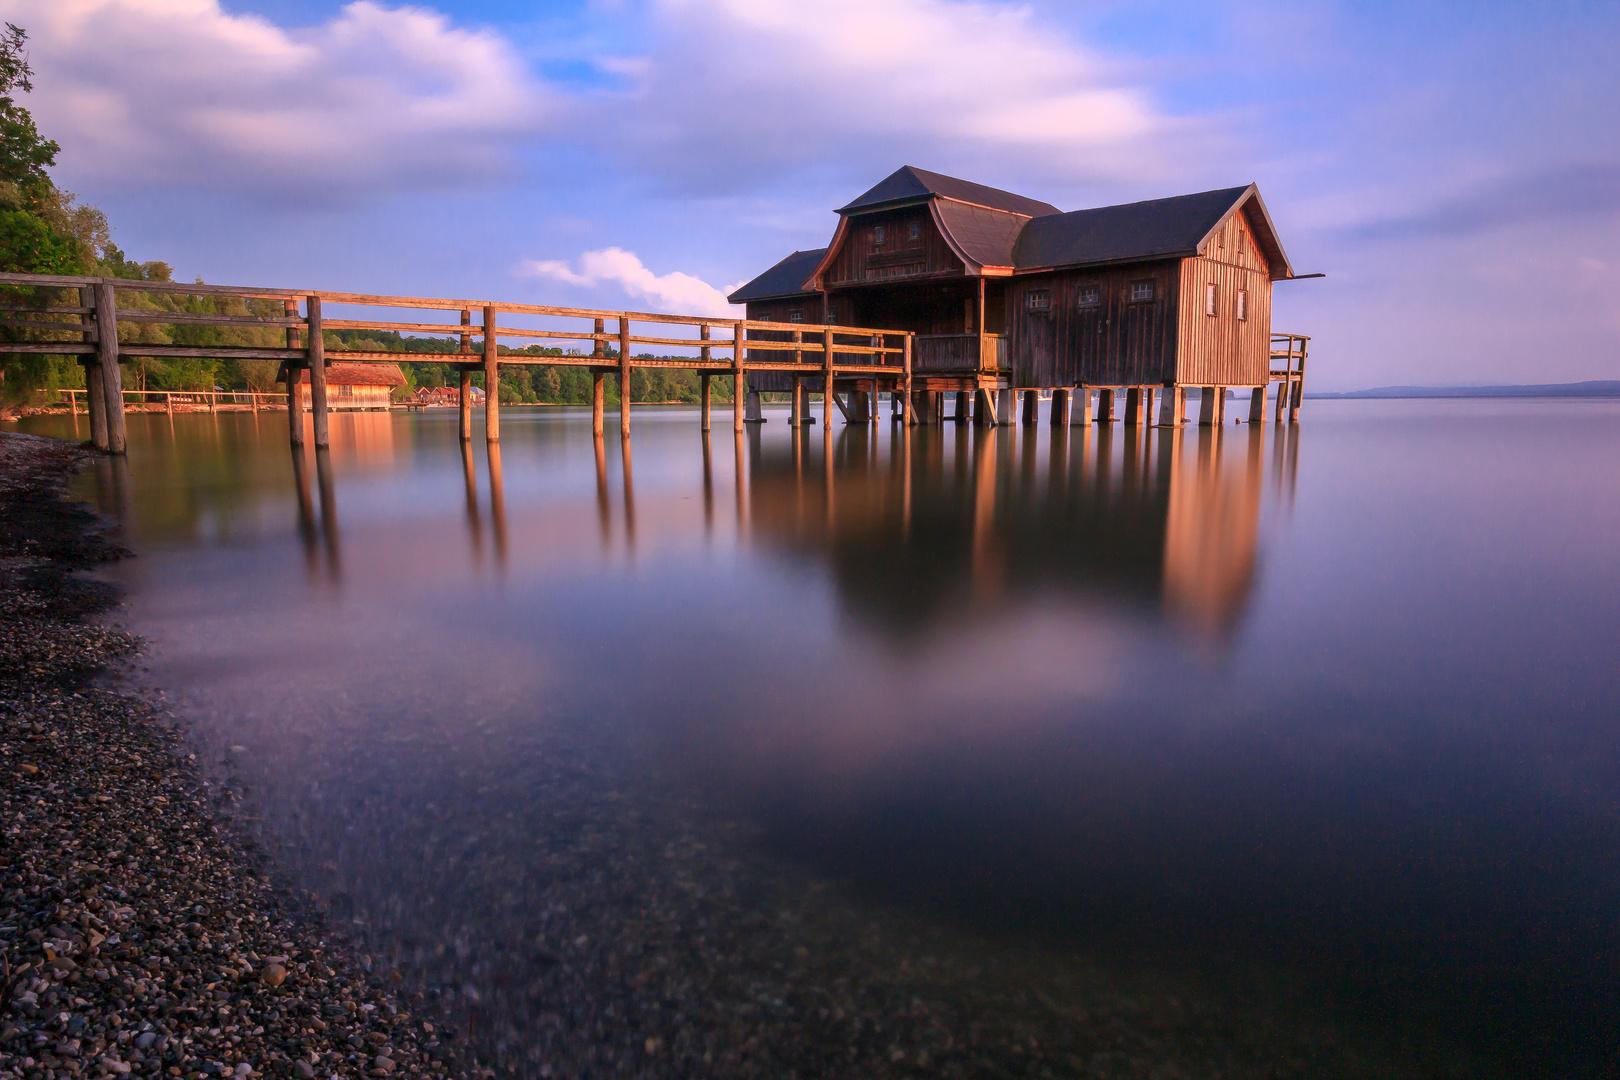 Bootshütte am Ammersee